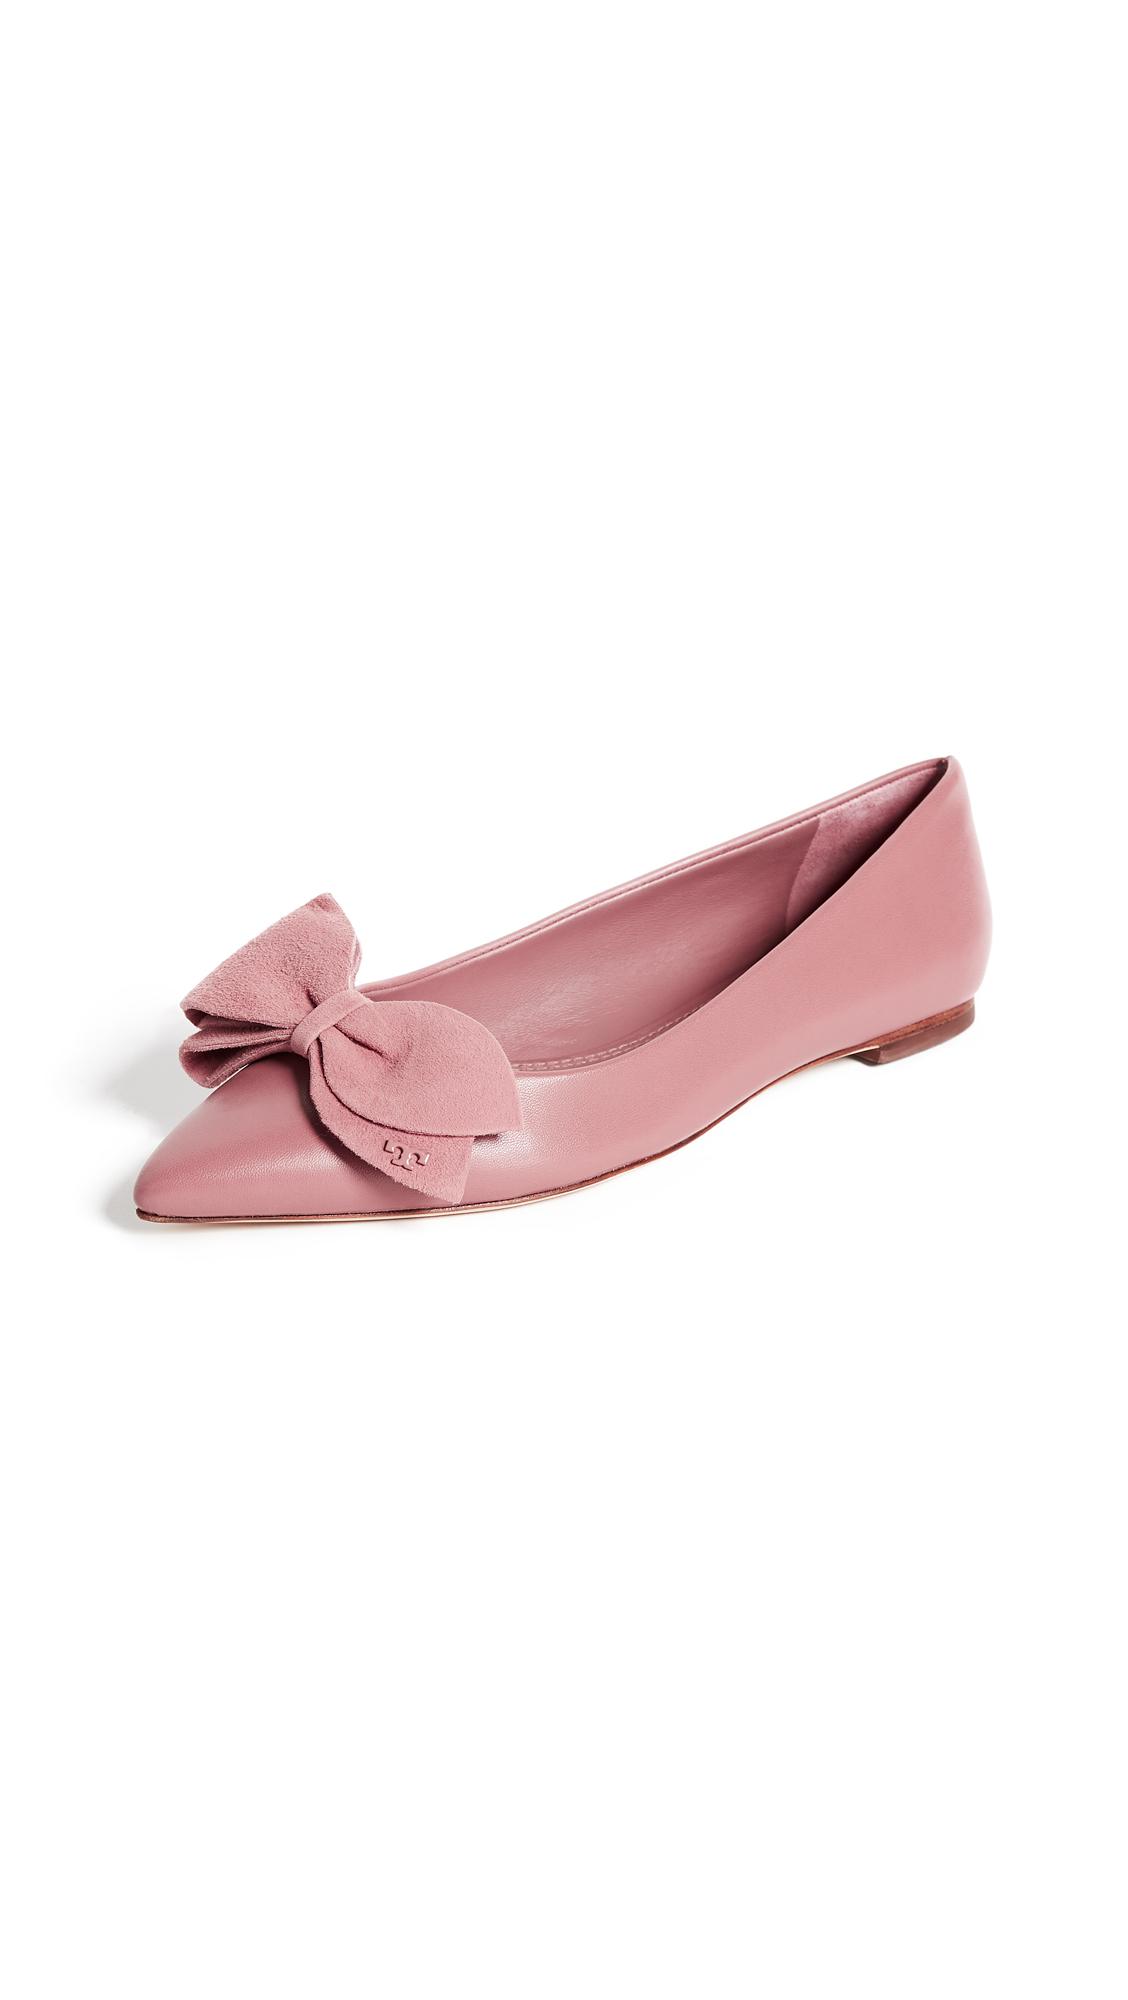 Tory Burch Rosalind Ballet Flats - Pink Magnolia